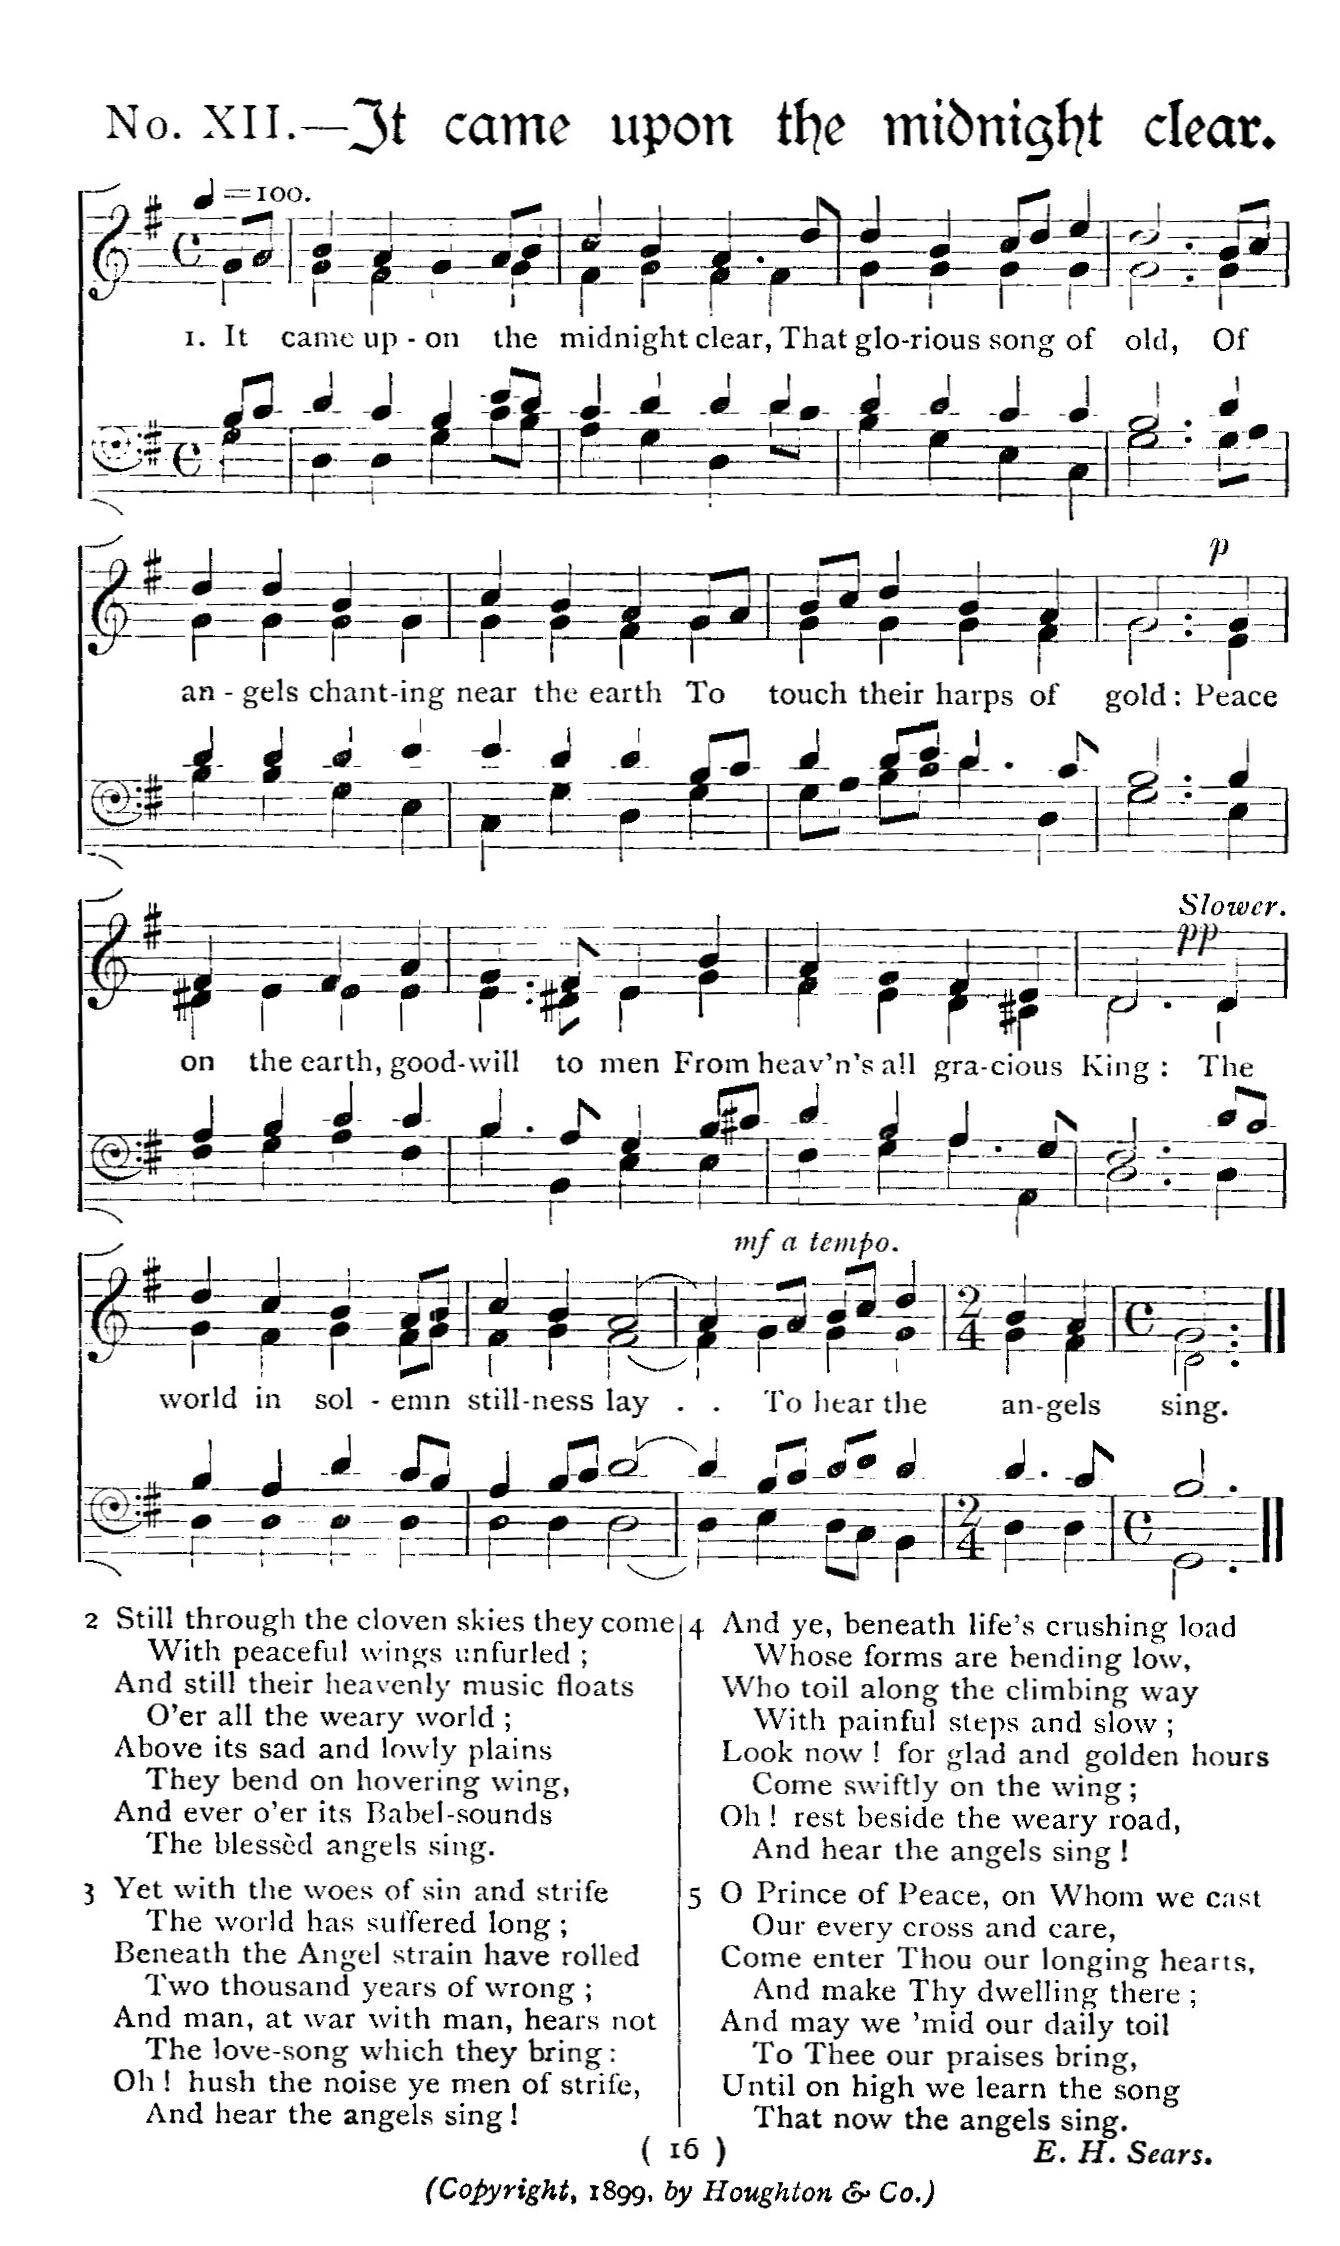 The wartburg hymnal chicago wartburg publishing house 1918 107